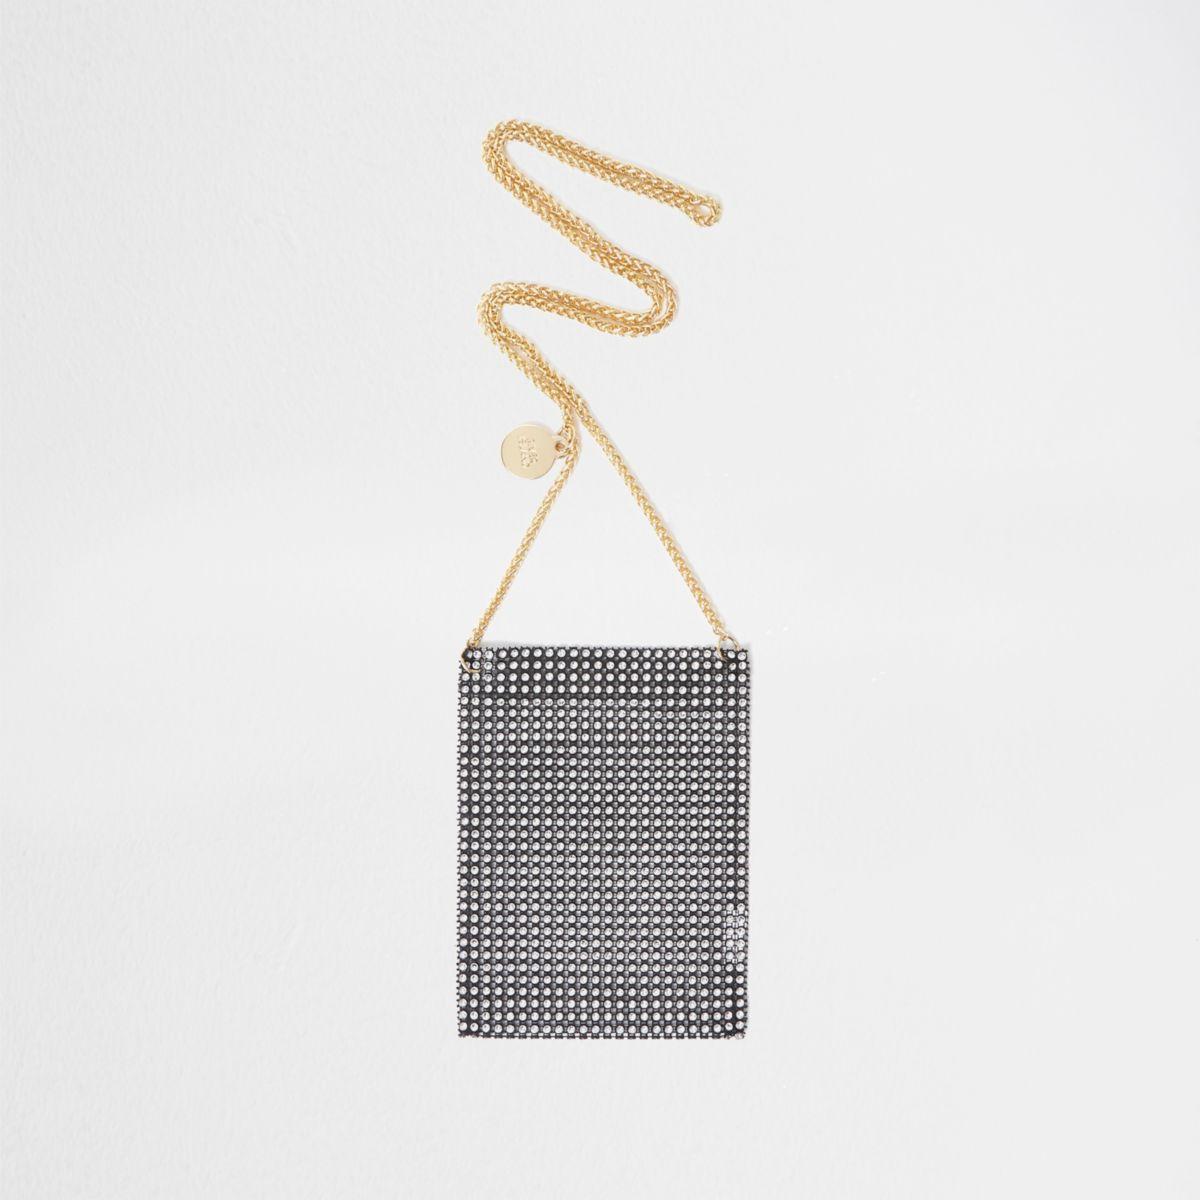 Black rhinestone cross body chain pouch bag